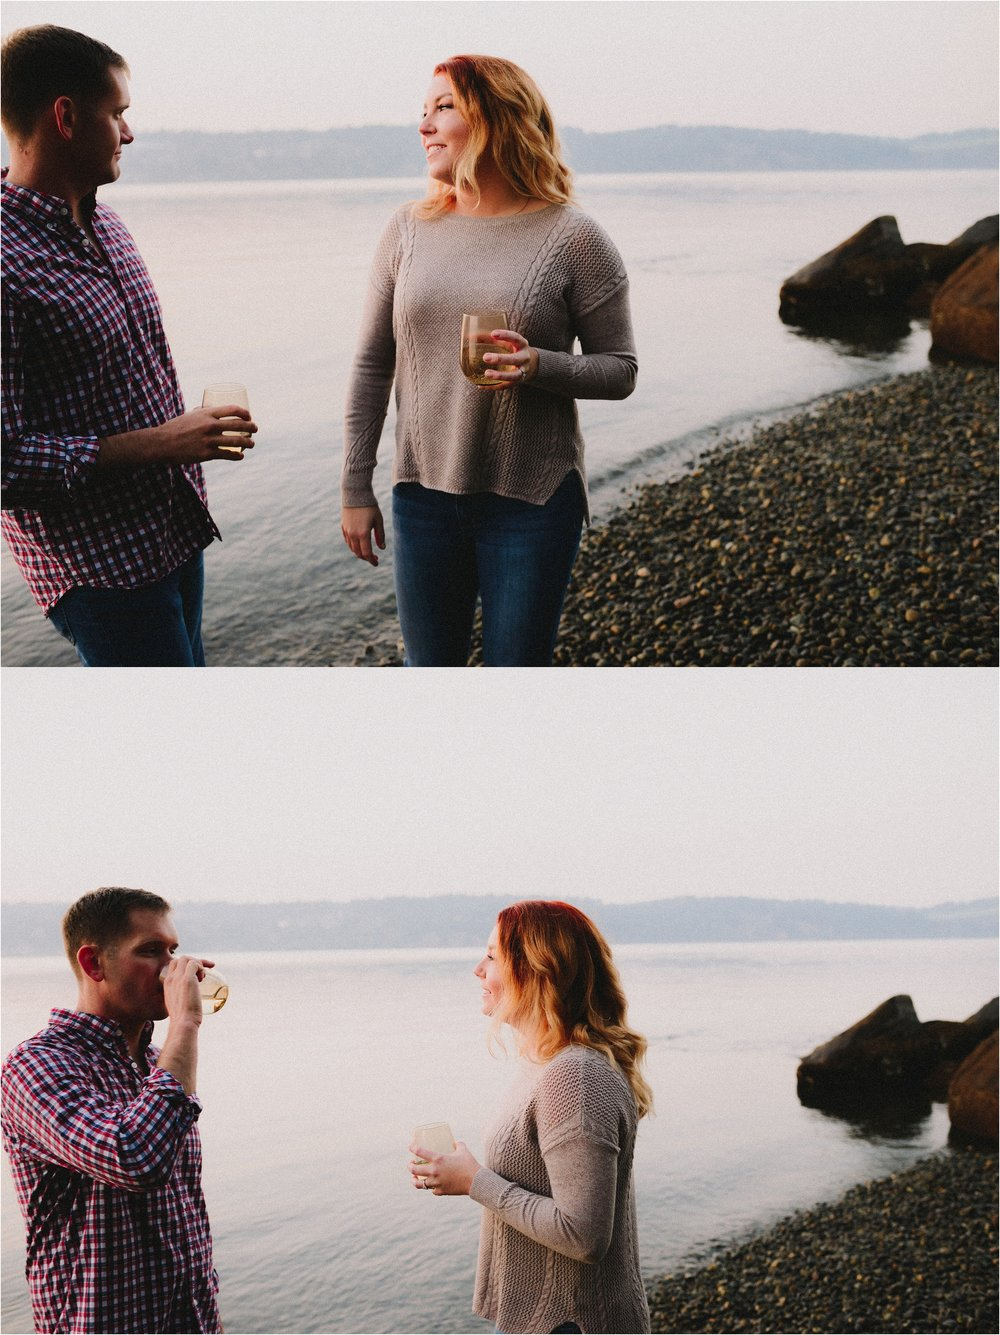 titlow-beach-park-engagement-session-jannicka-mayte-anchorage-alaska-wedding-photographer_0038.jpg